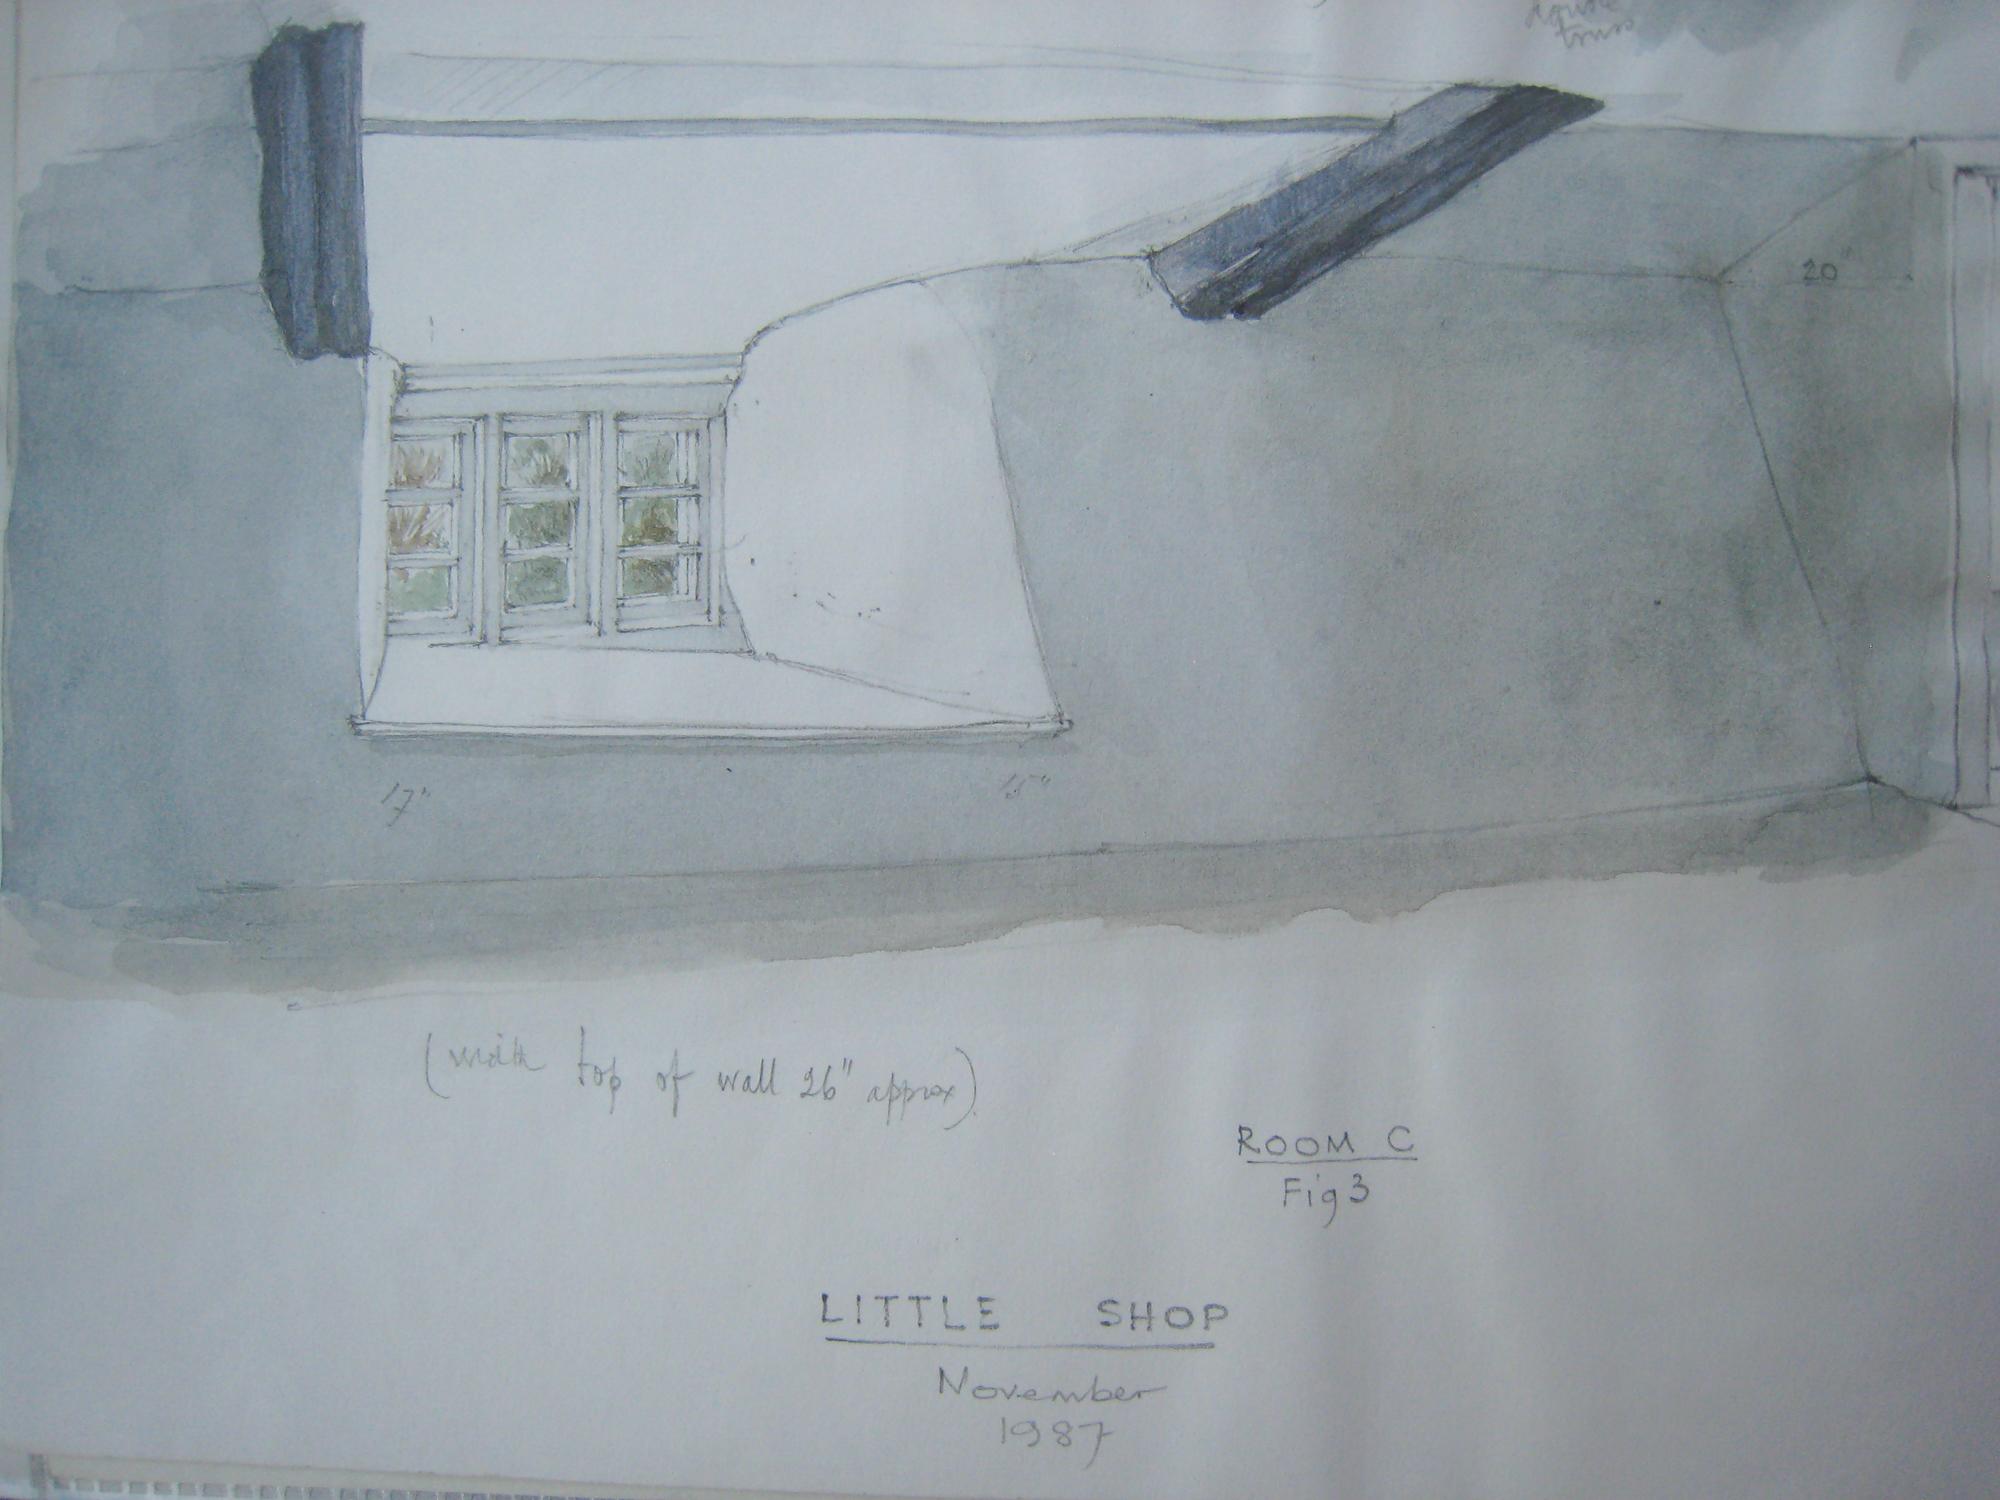 Little Shop: upstairs room C figure 3